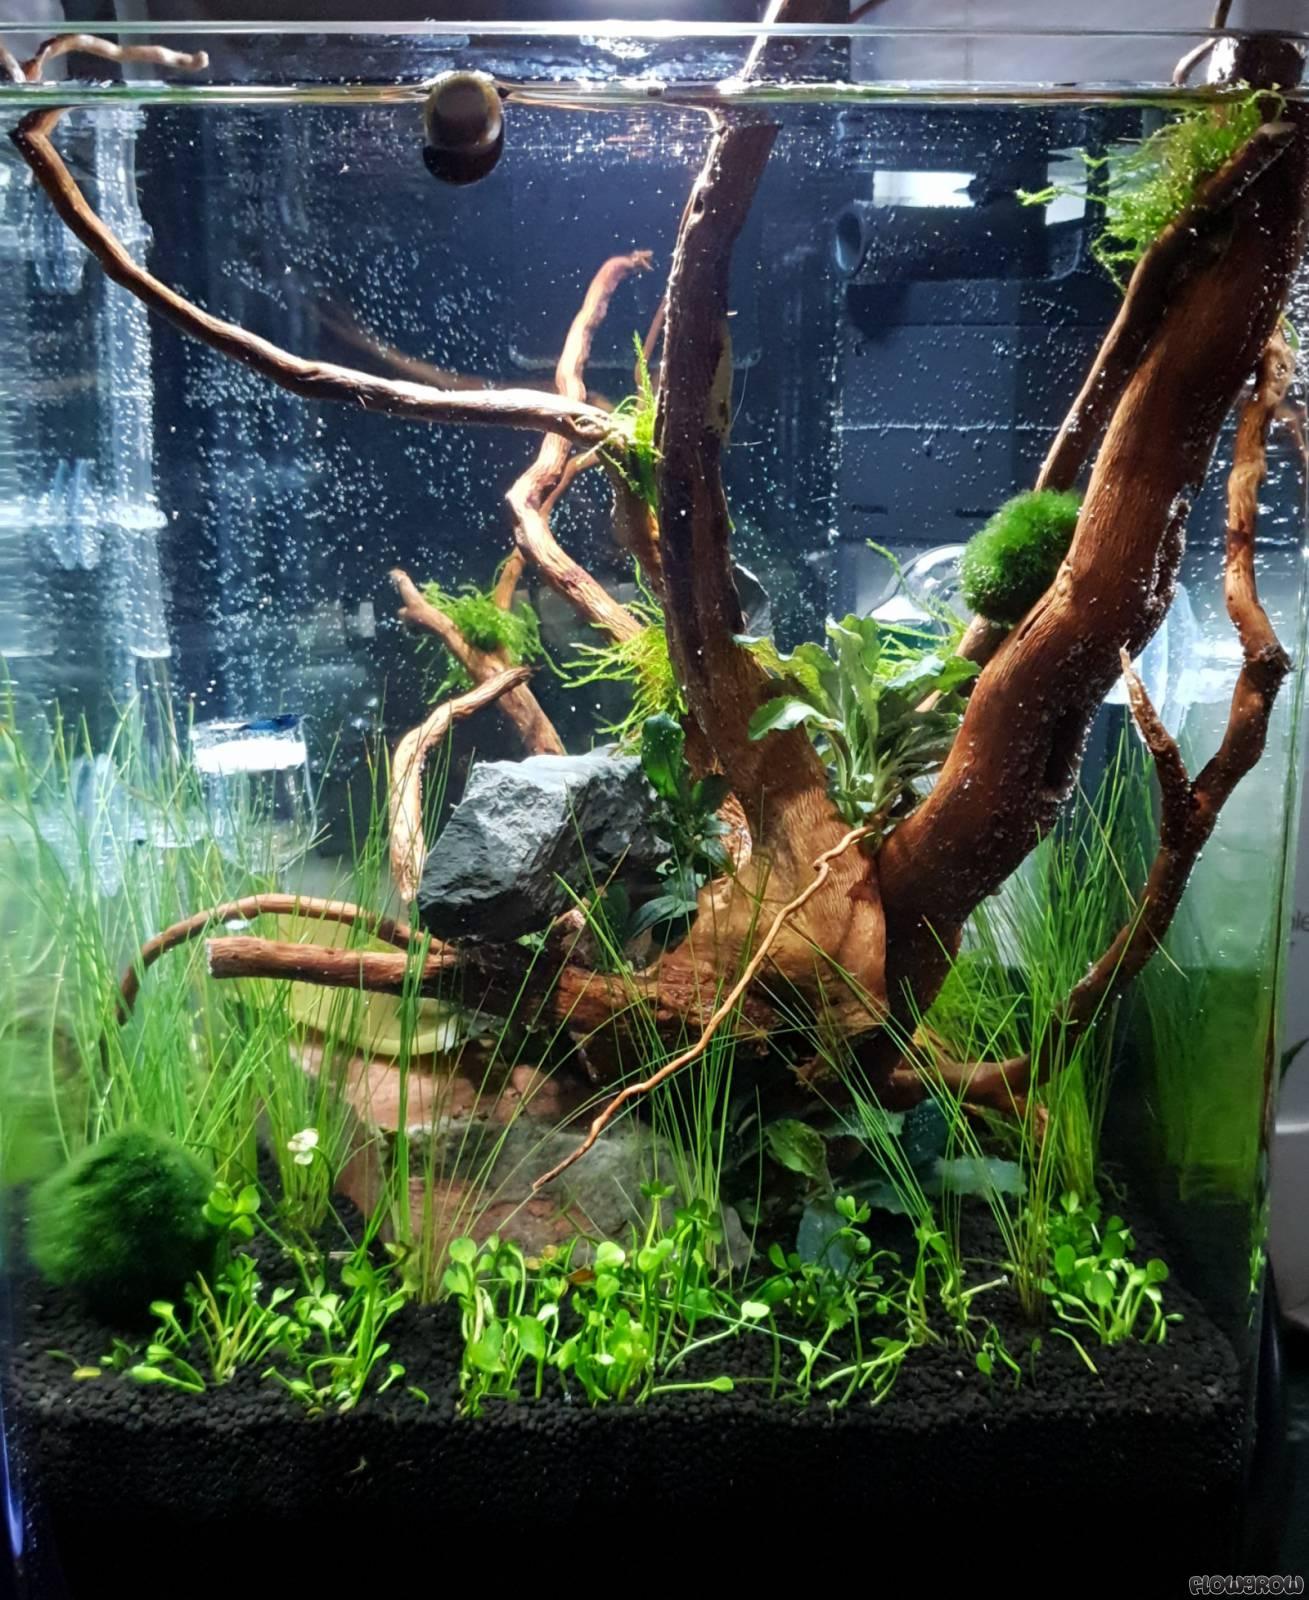 Minicube Küche - Flowgrow Aquascape/Aquarium Database